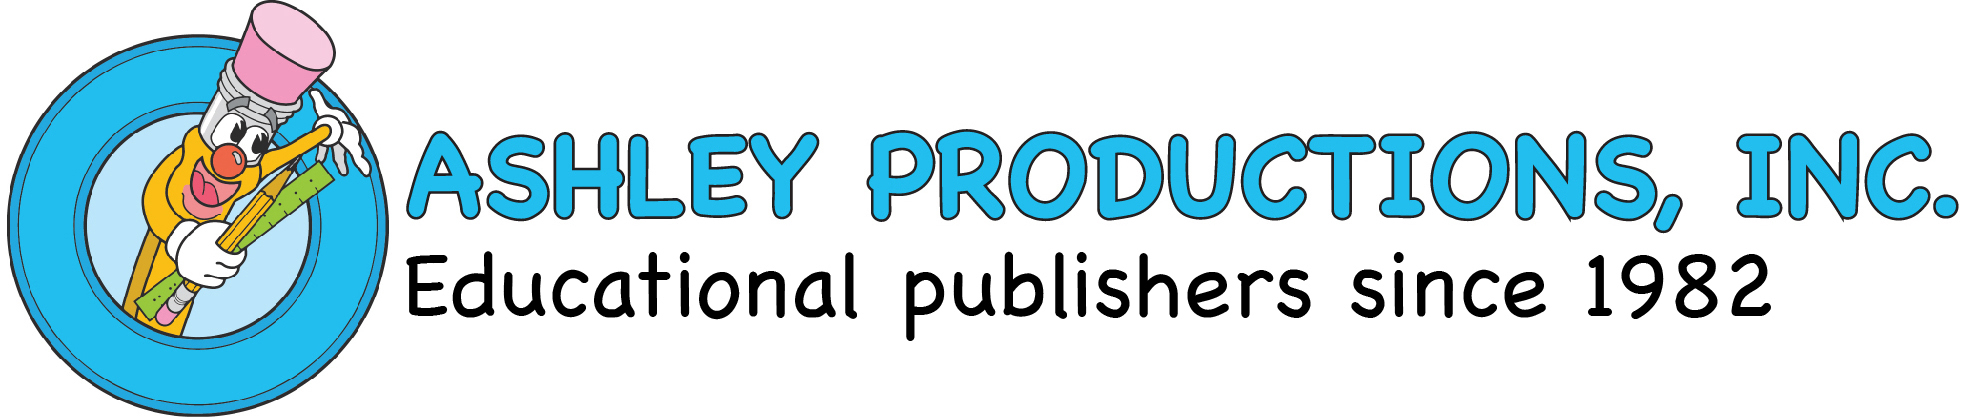 Ashley Productions, Inc.